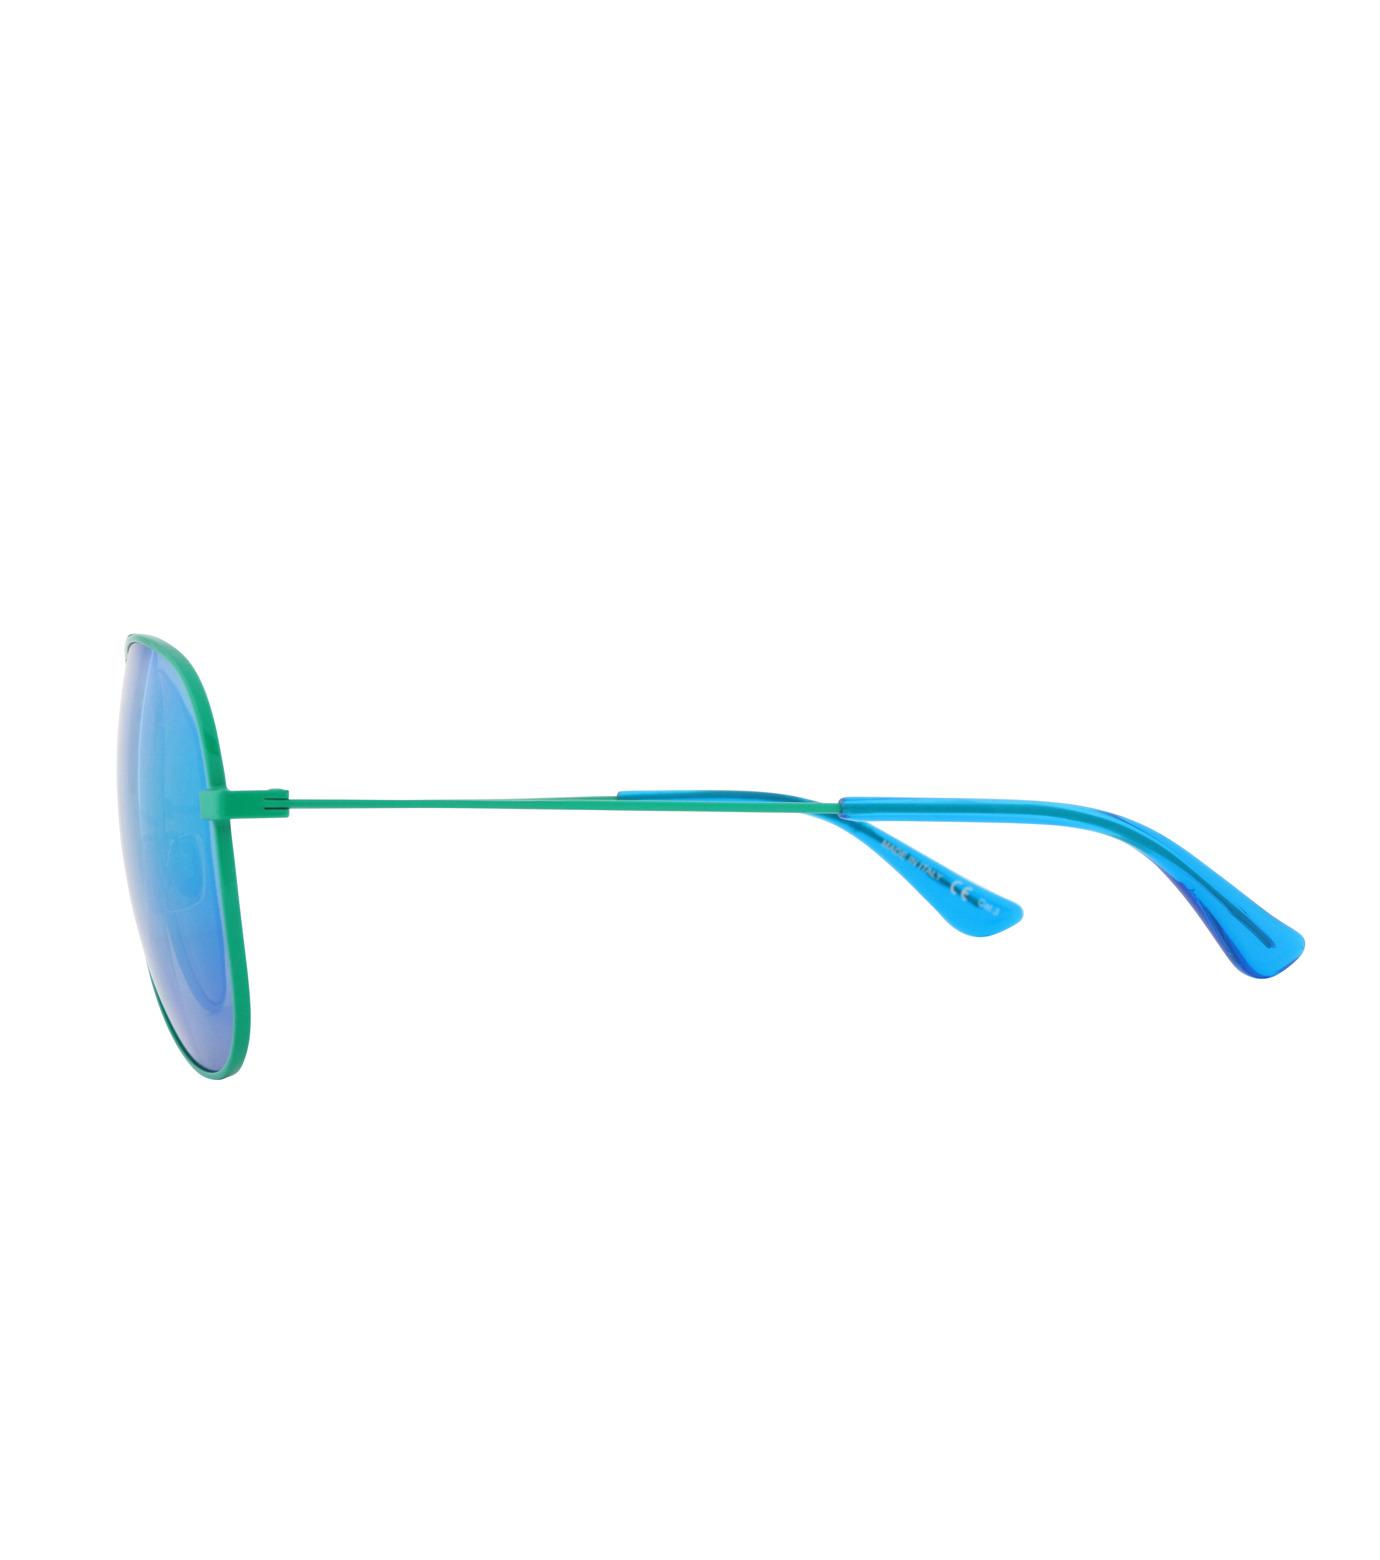 SAINT LAURENT(サンローラン)のTeardrop-GREEN(アイウェア/eyewear)-427758-Y9902-22 拡大詳細画像2